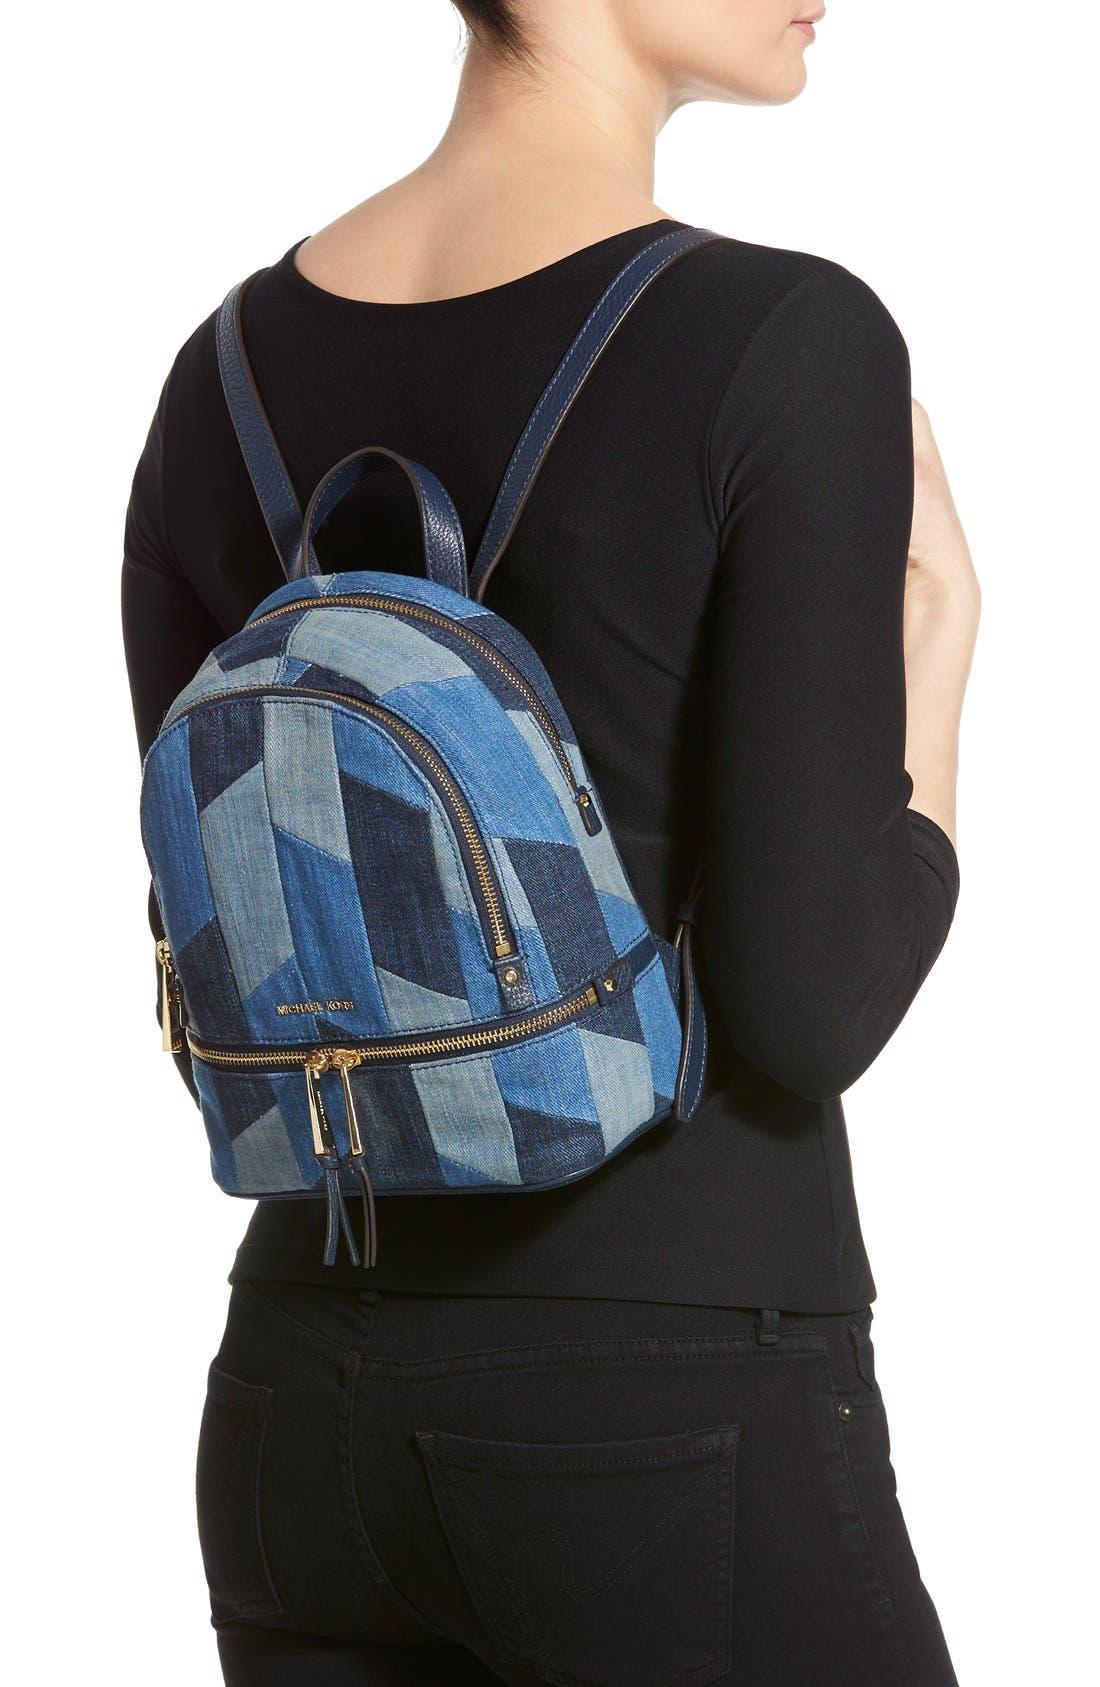 Alternate Image 2  - Michael Kors 'Small Rhea Zip' Denim Backpack